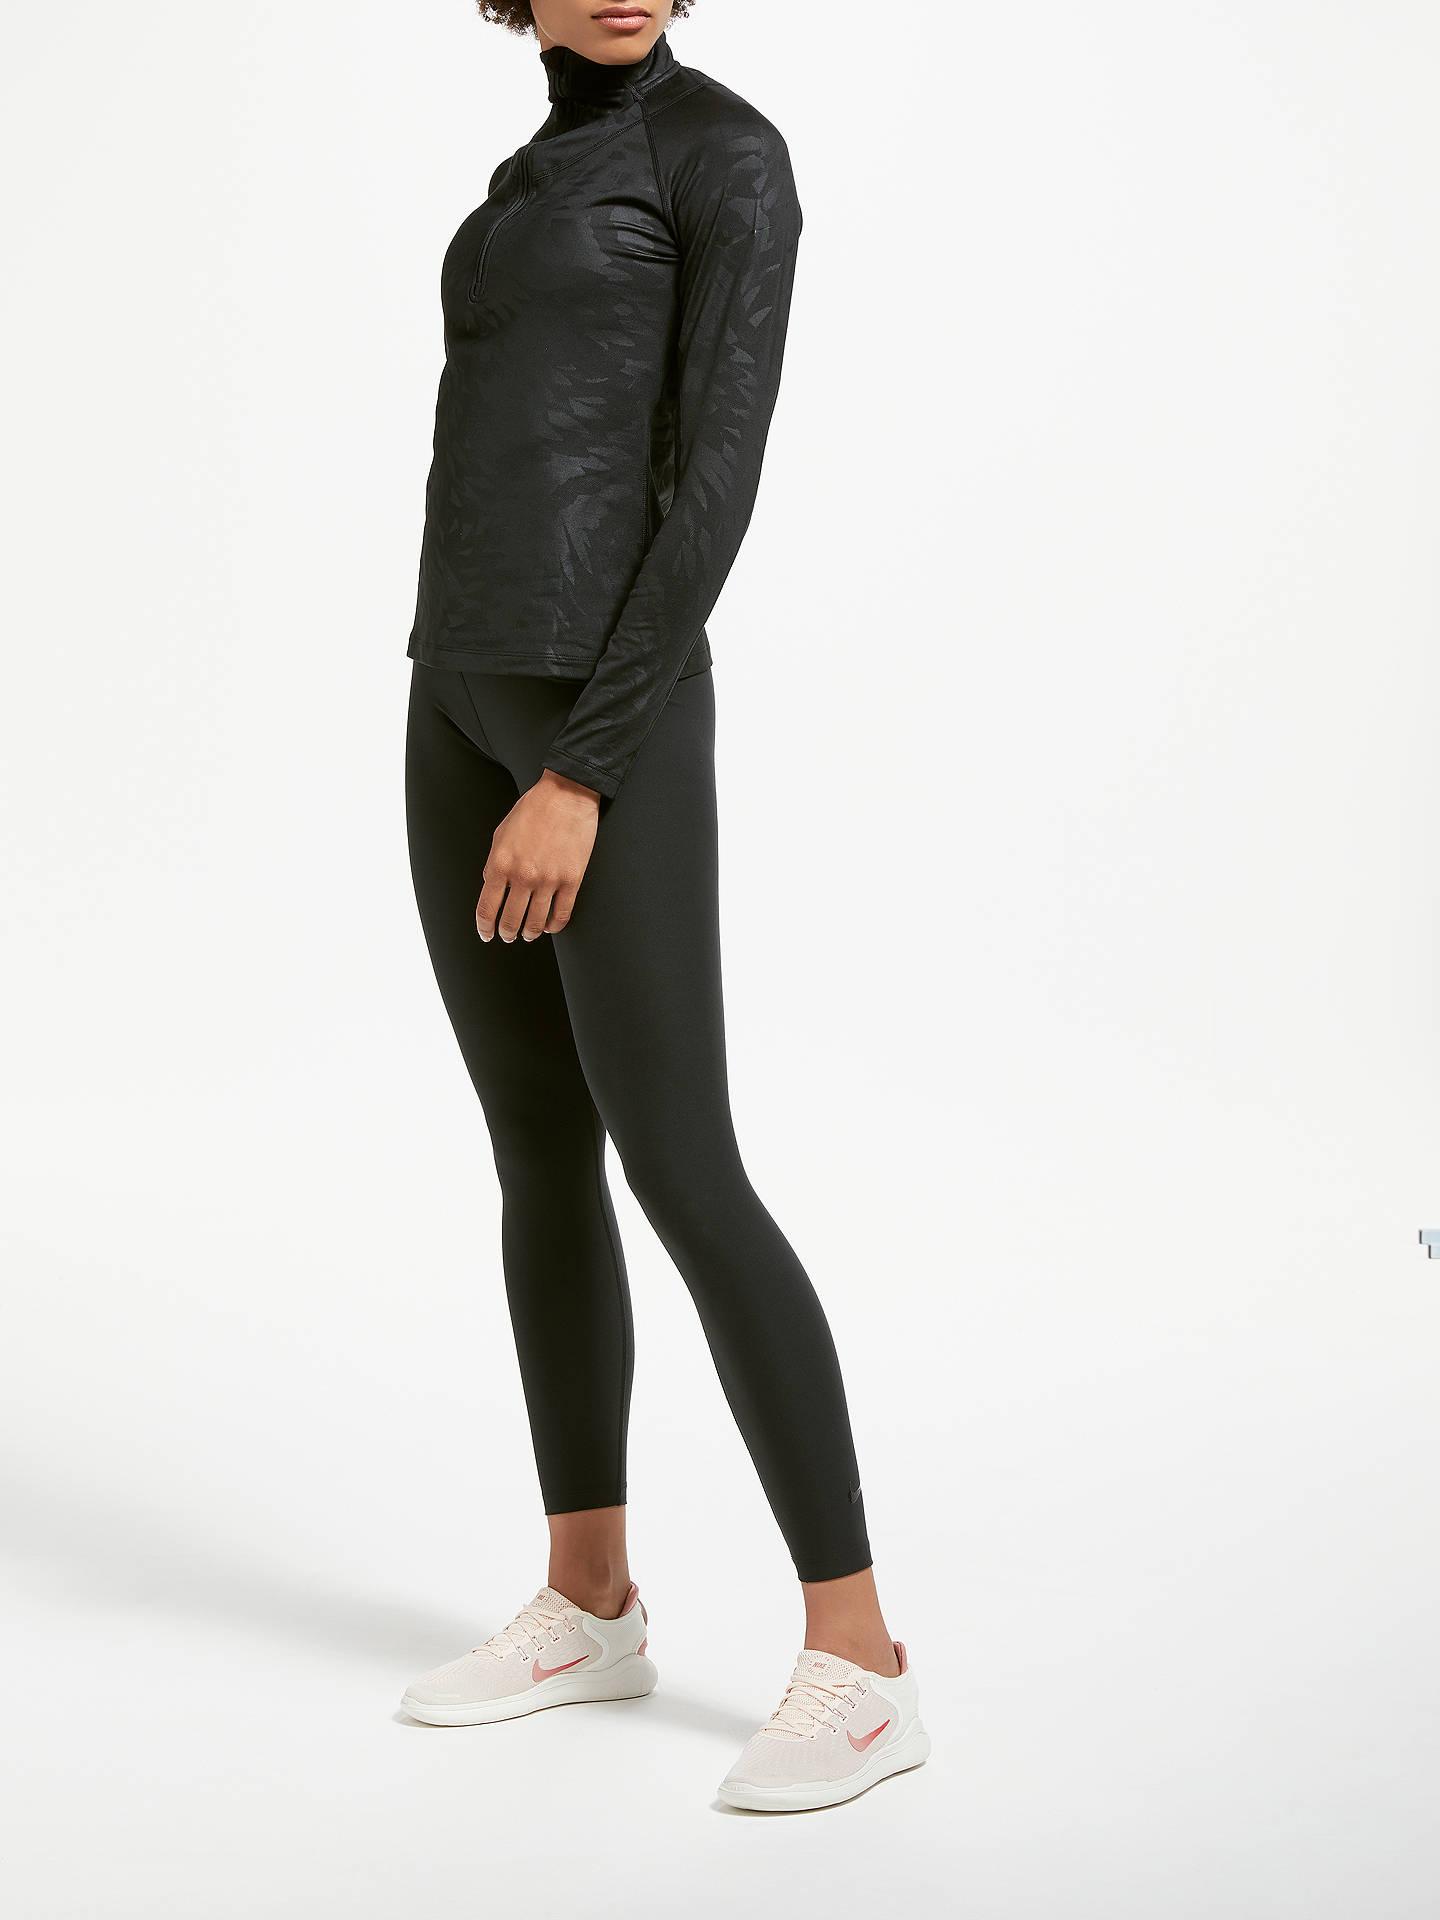 b71ee480b1739 ... Buy Nike Pro Warm Embossed Training Top, Black, XS Online at  johnlewis.com ...